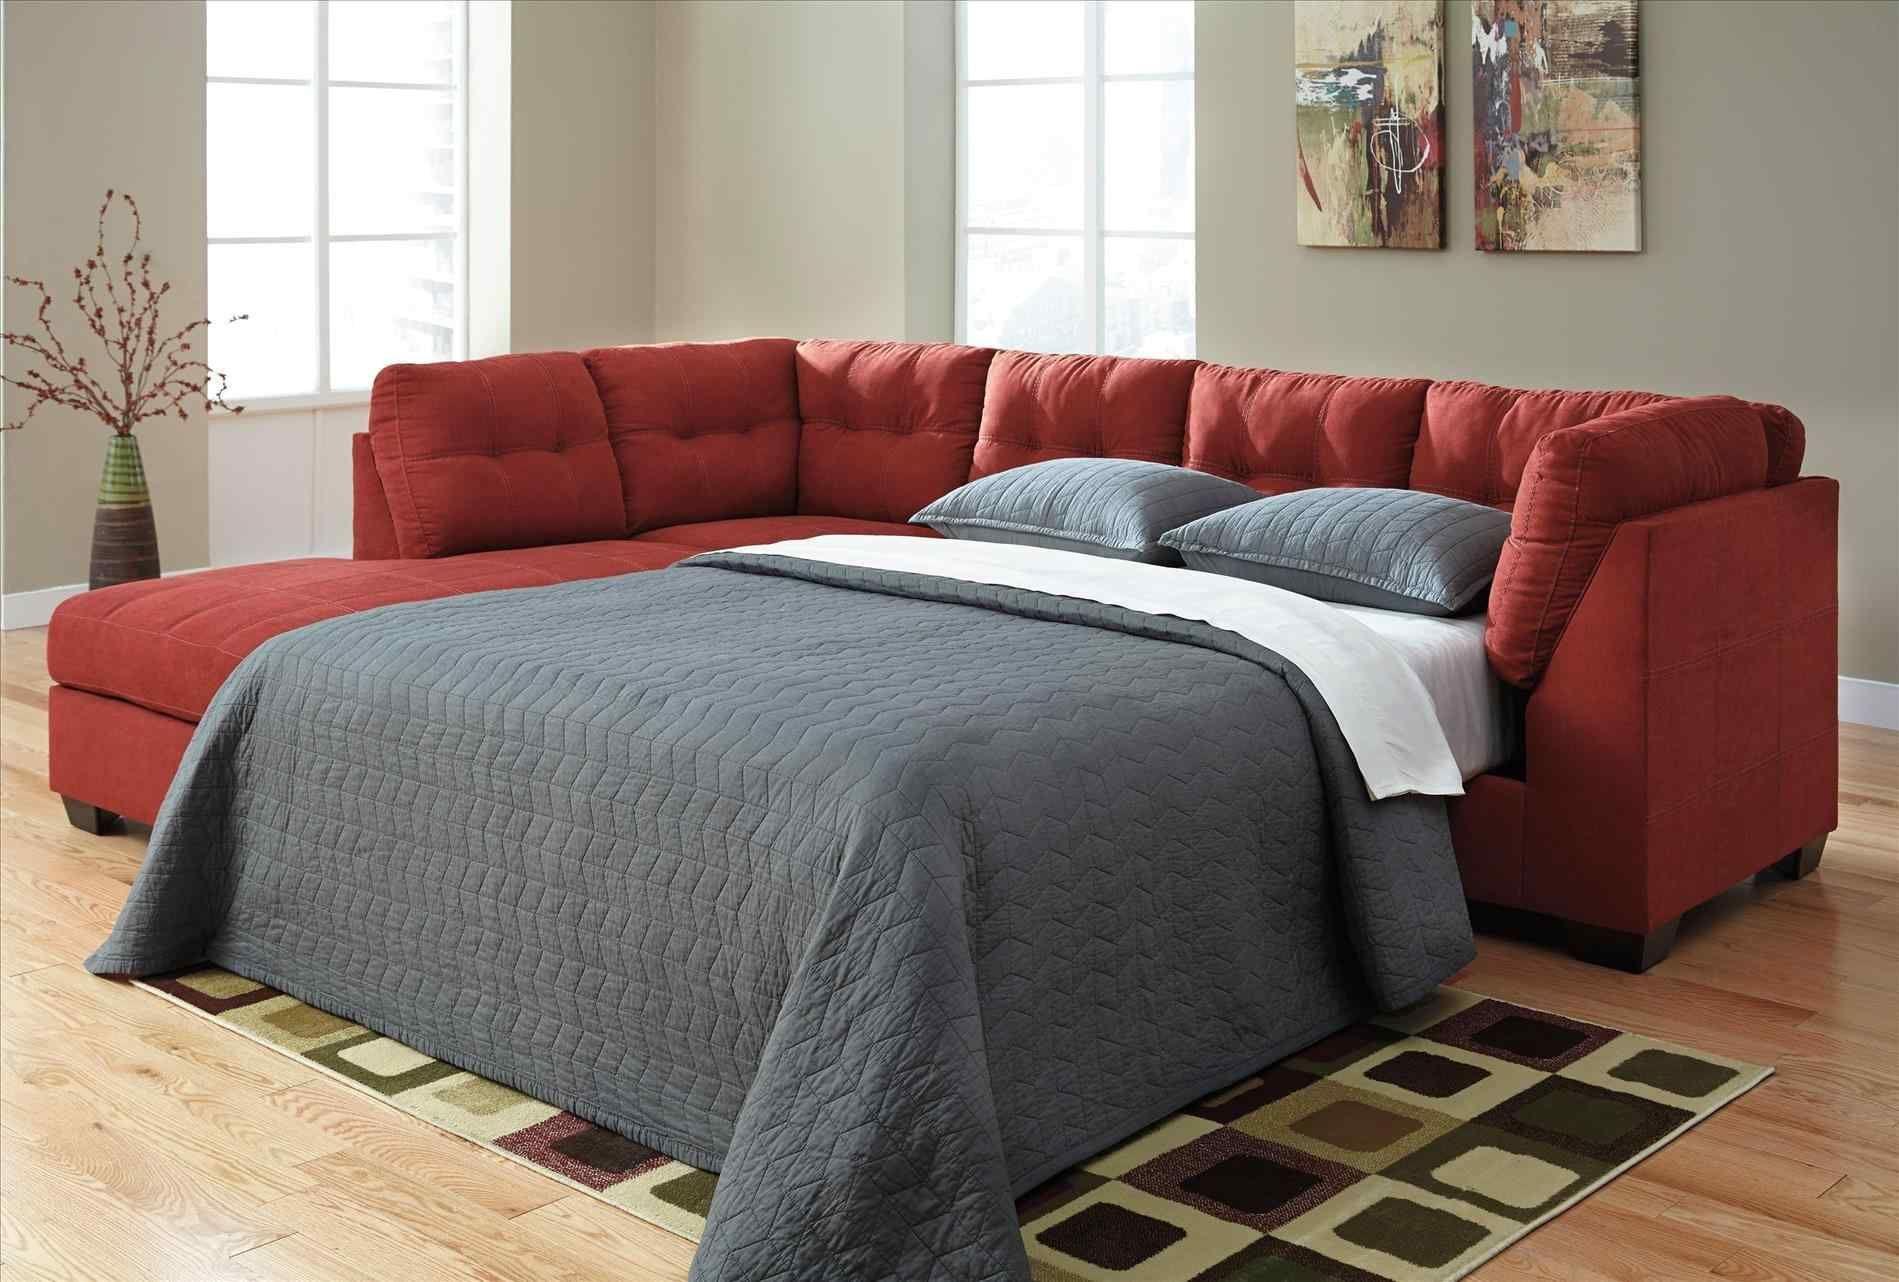 Modern Best Sleeper Sofa For Everyday Use Sleep Memory Foam Bed